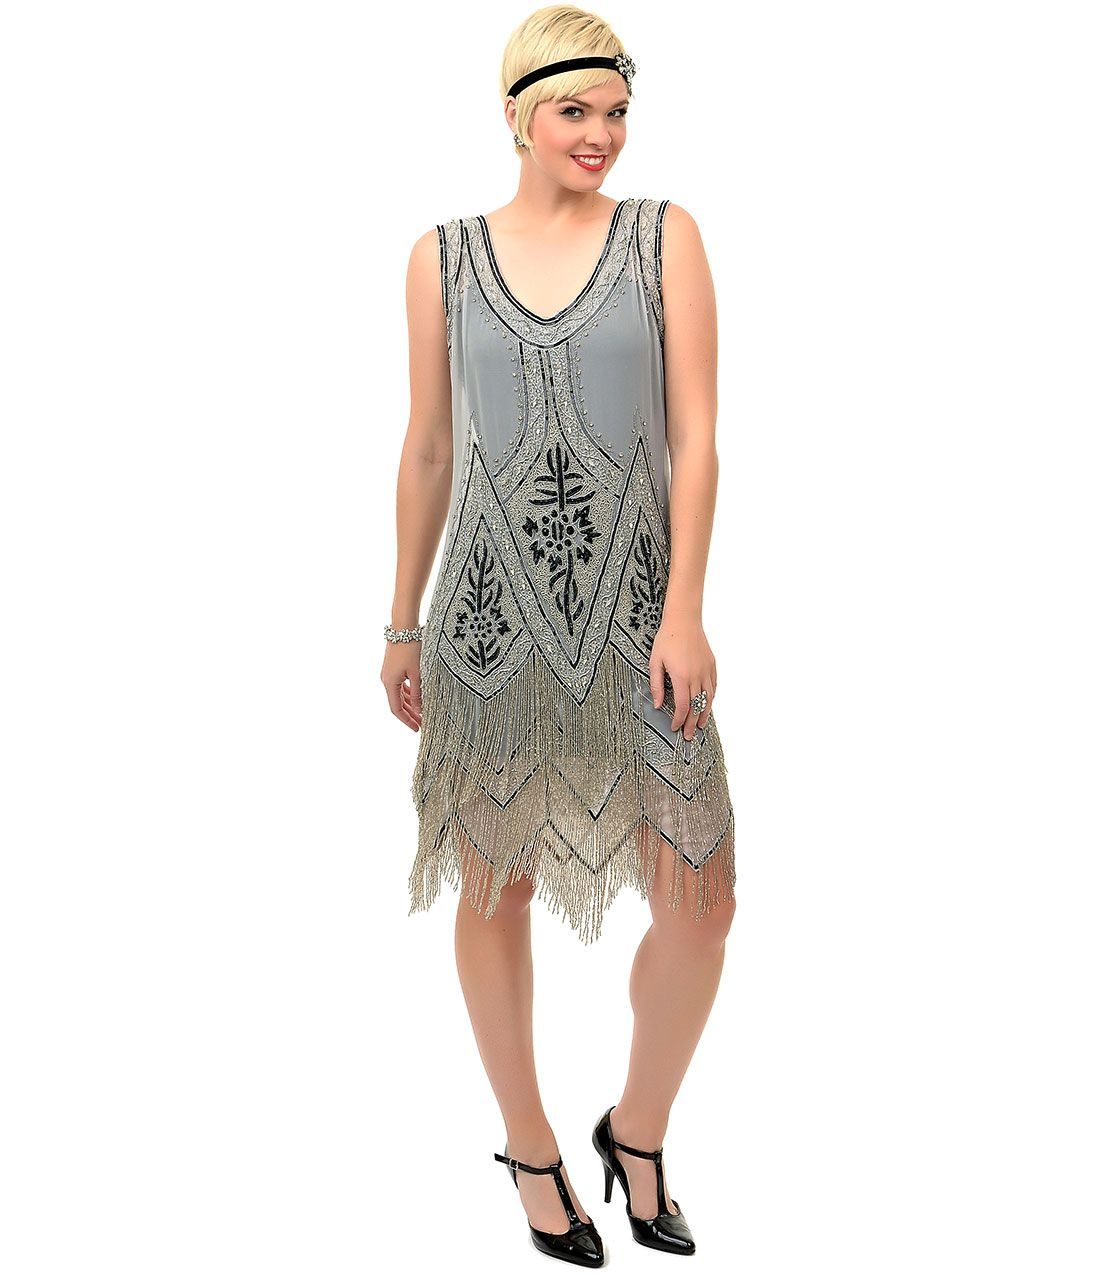 1920s style dresses flapper dresses to gatsby dresses